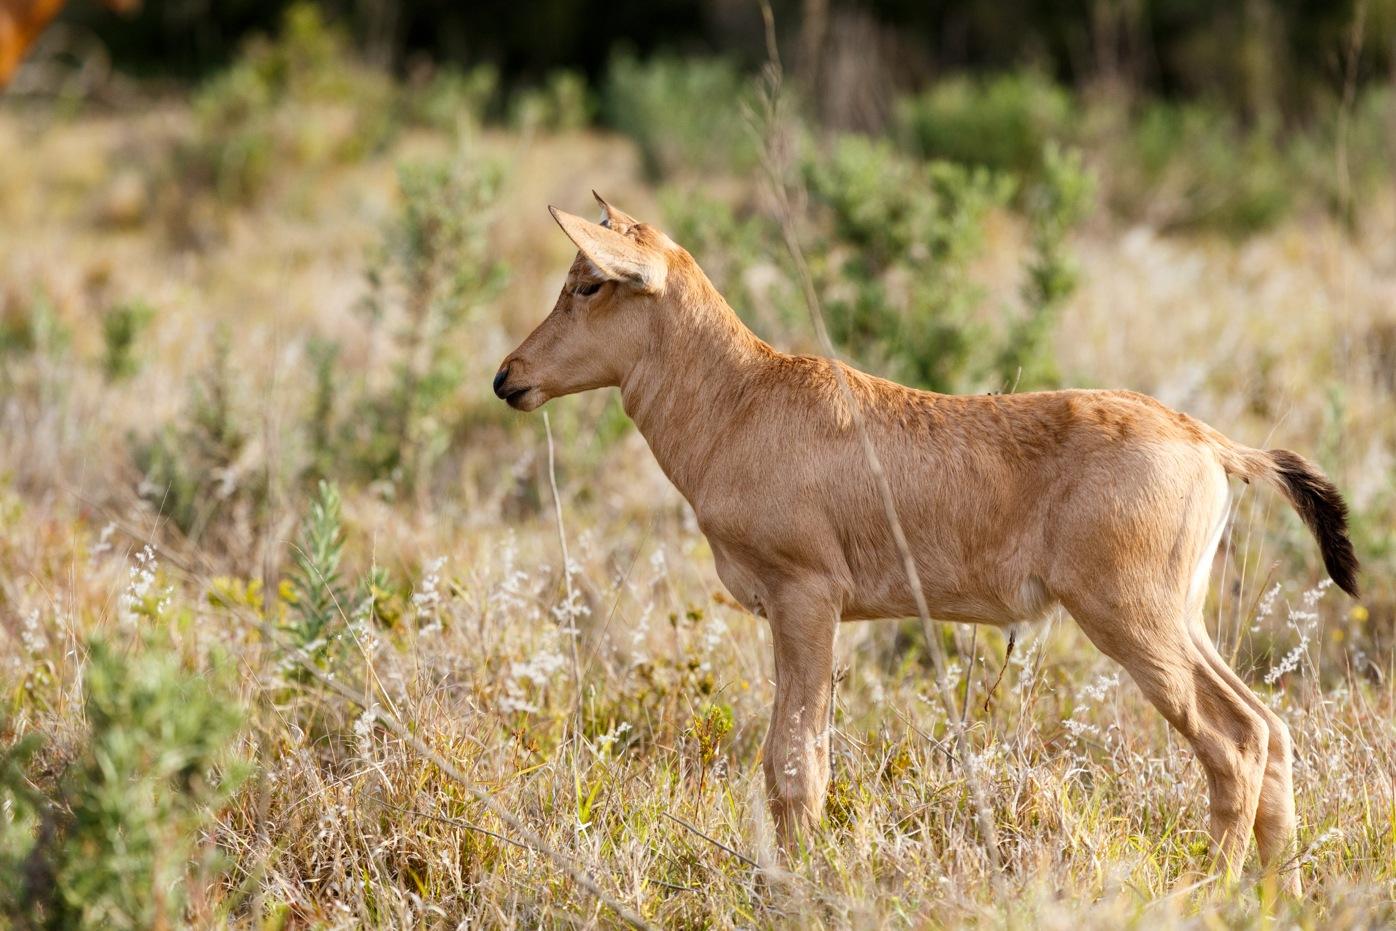 Newborn Red Hartebeest standing like a dog by Charissa de Scande Lotter